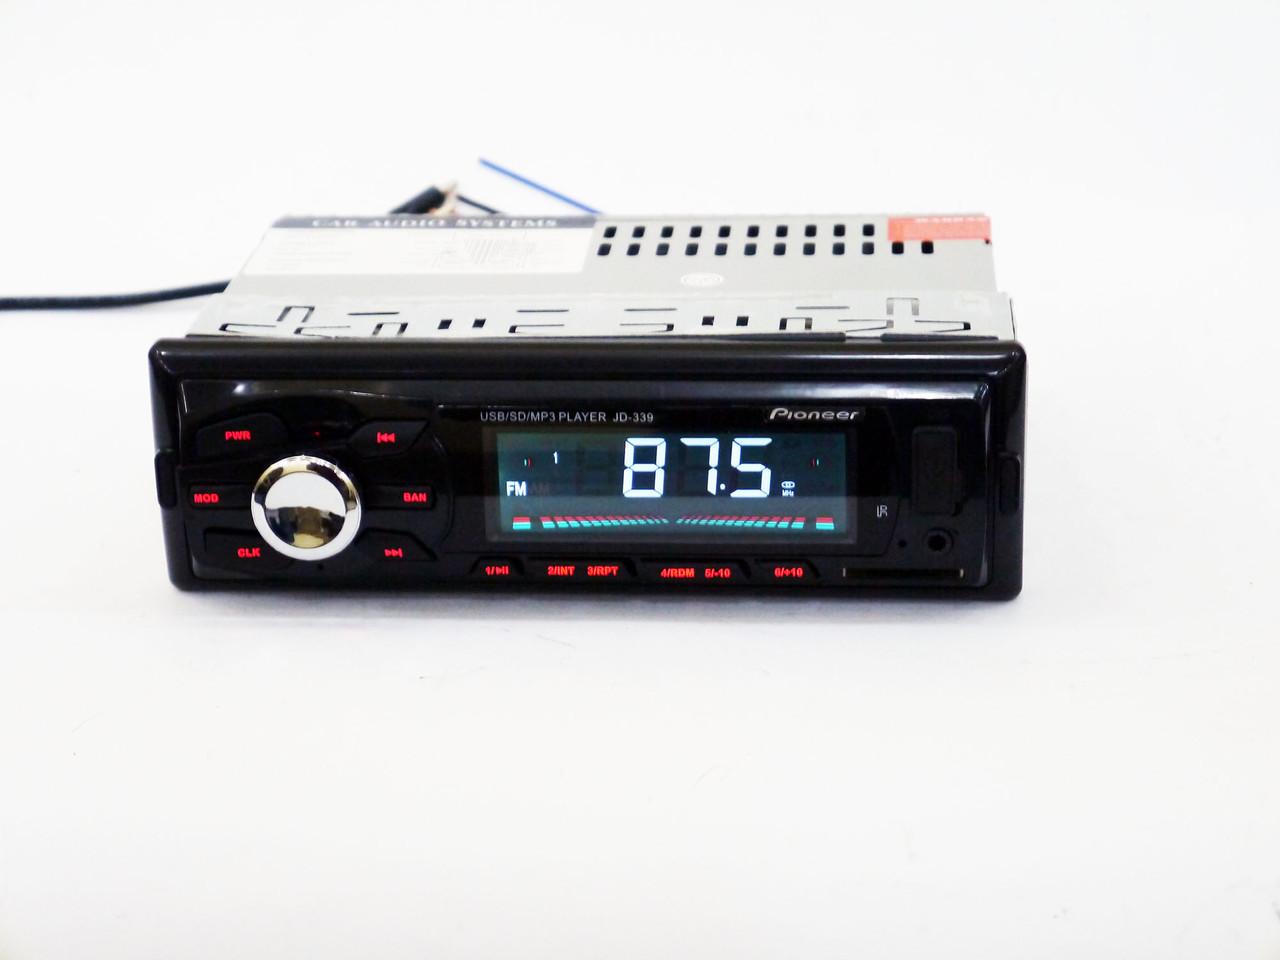 Автомагнитола Pioneer JD-339 ISO Usb+Sd+Fm+Aux+ пульт (4x50W)